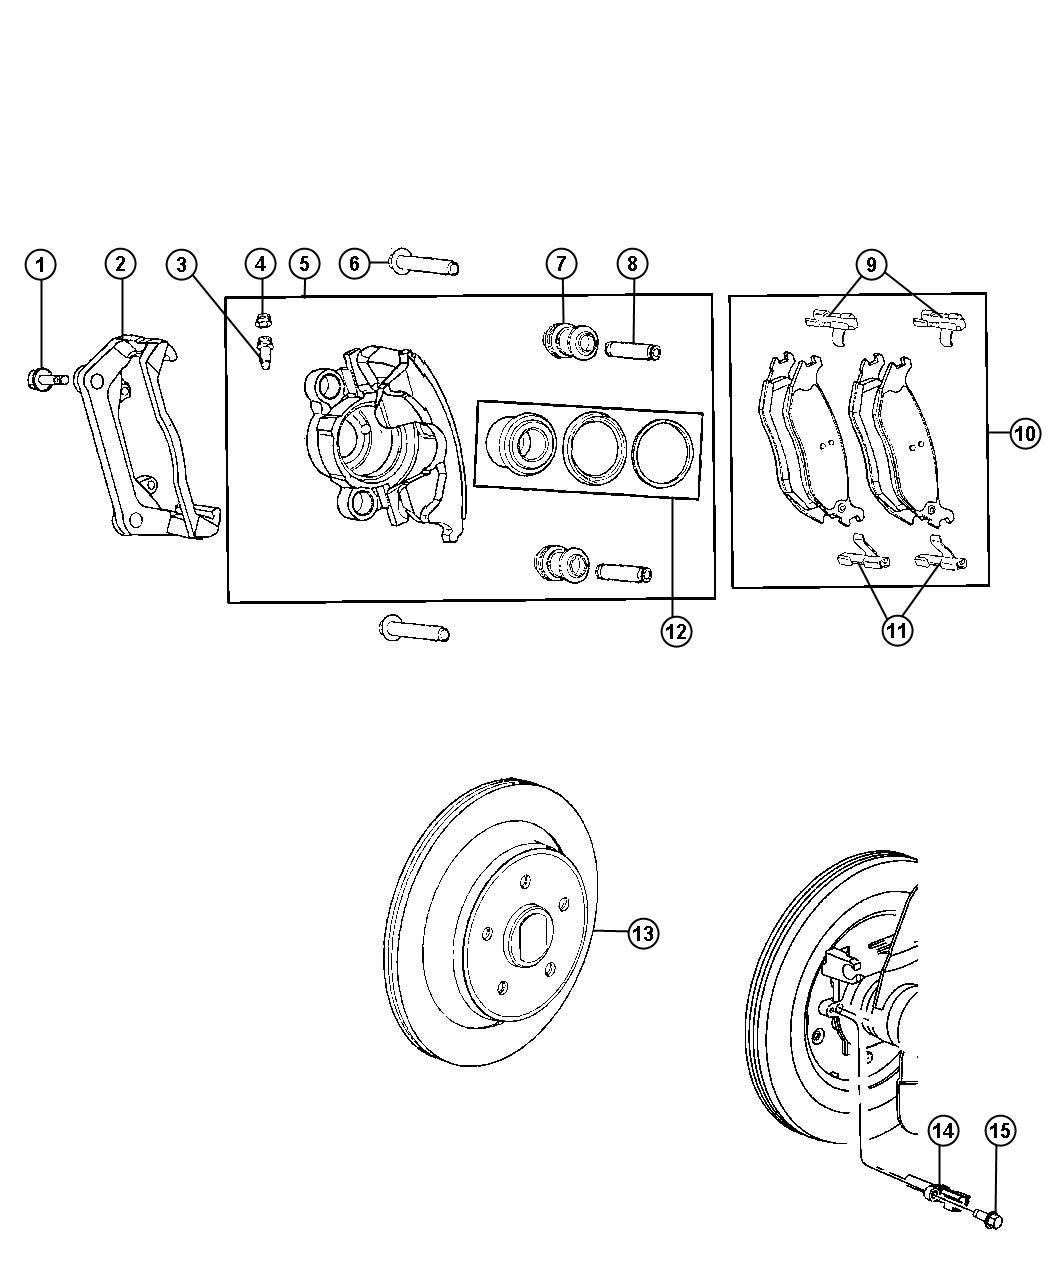 Service manual [2008 Chrysler Aspen Repair Rear Brakes